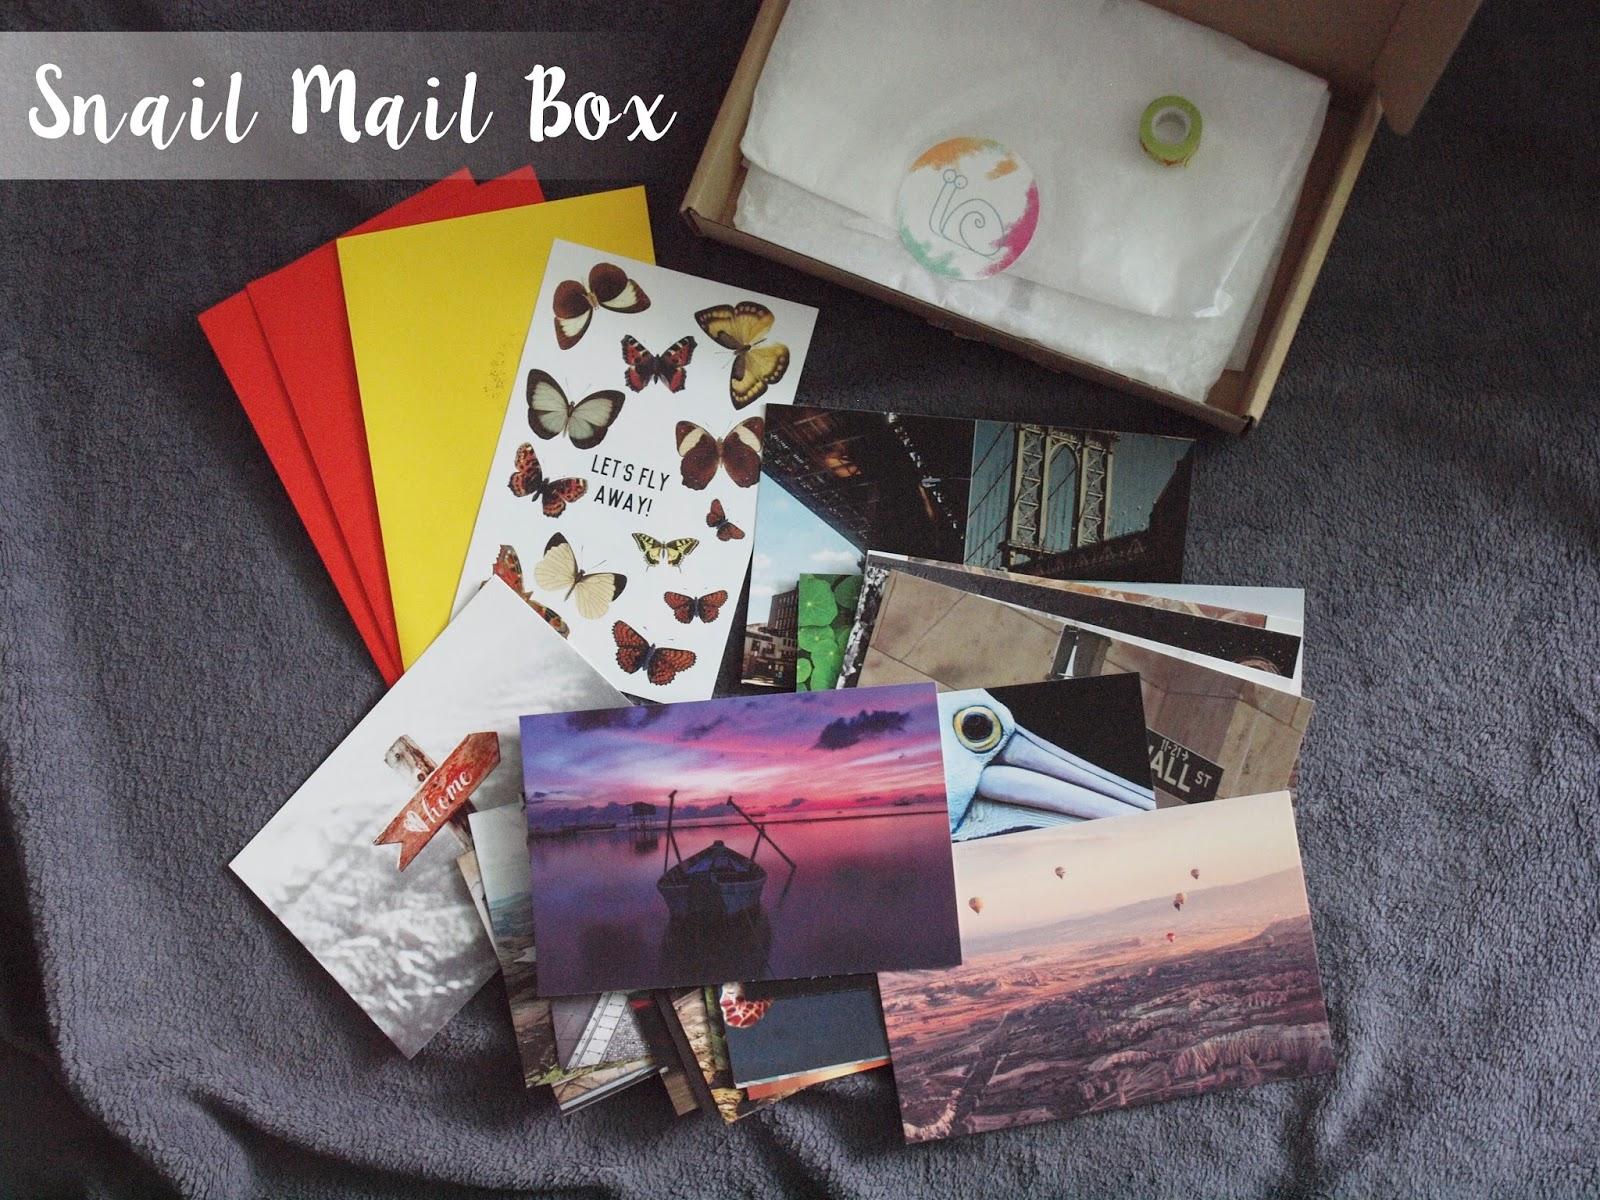 Nowy Snail Mail Box!